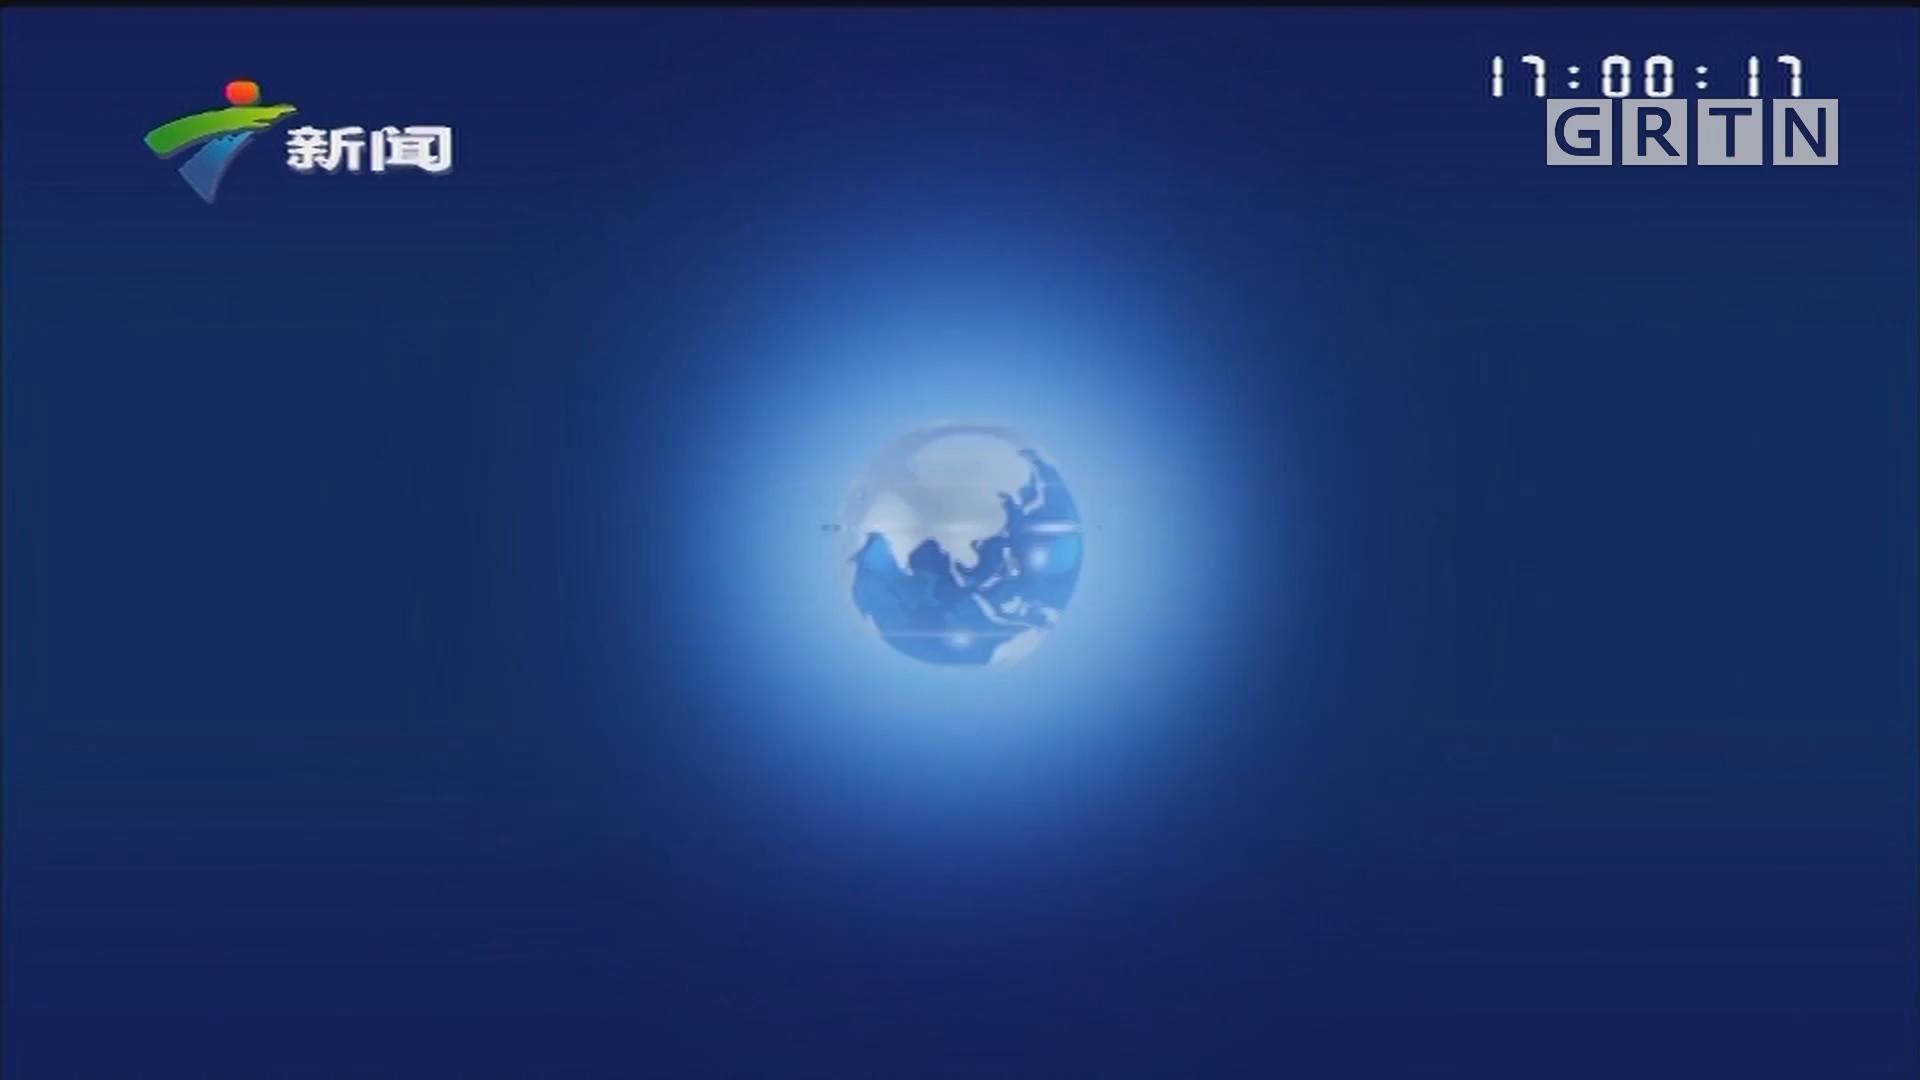 [HD][2019-10-23]正点播报:汕头:交通建设日新月异 立体交通日渐形成